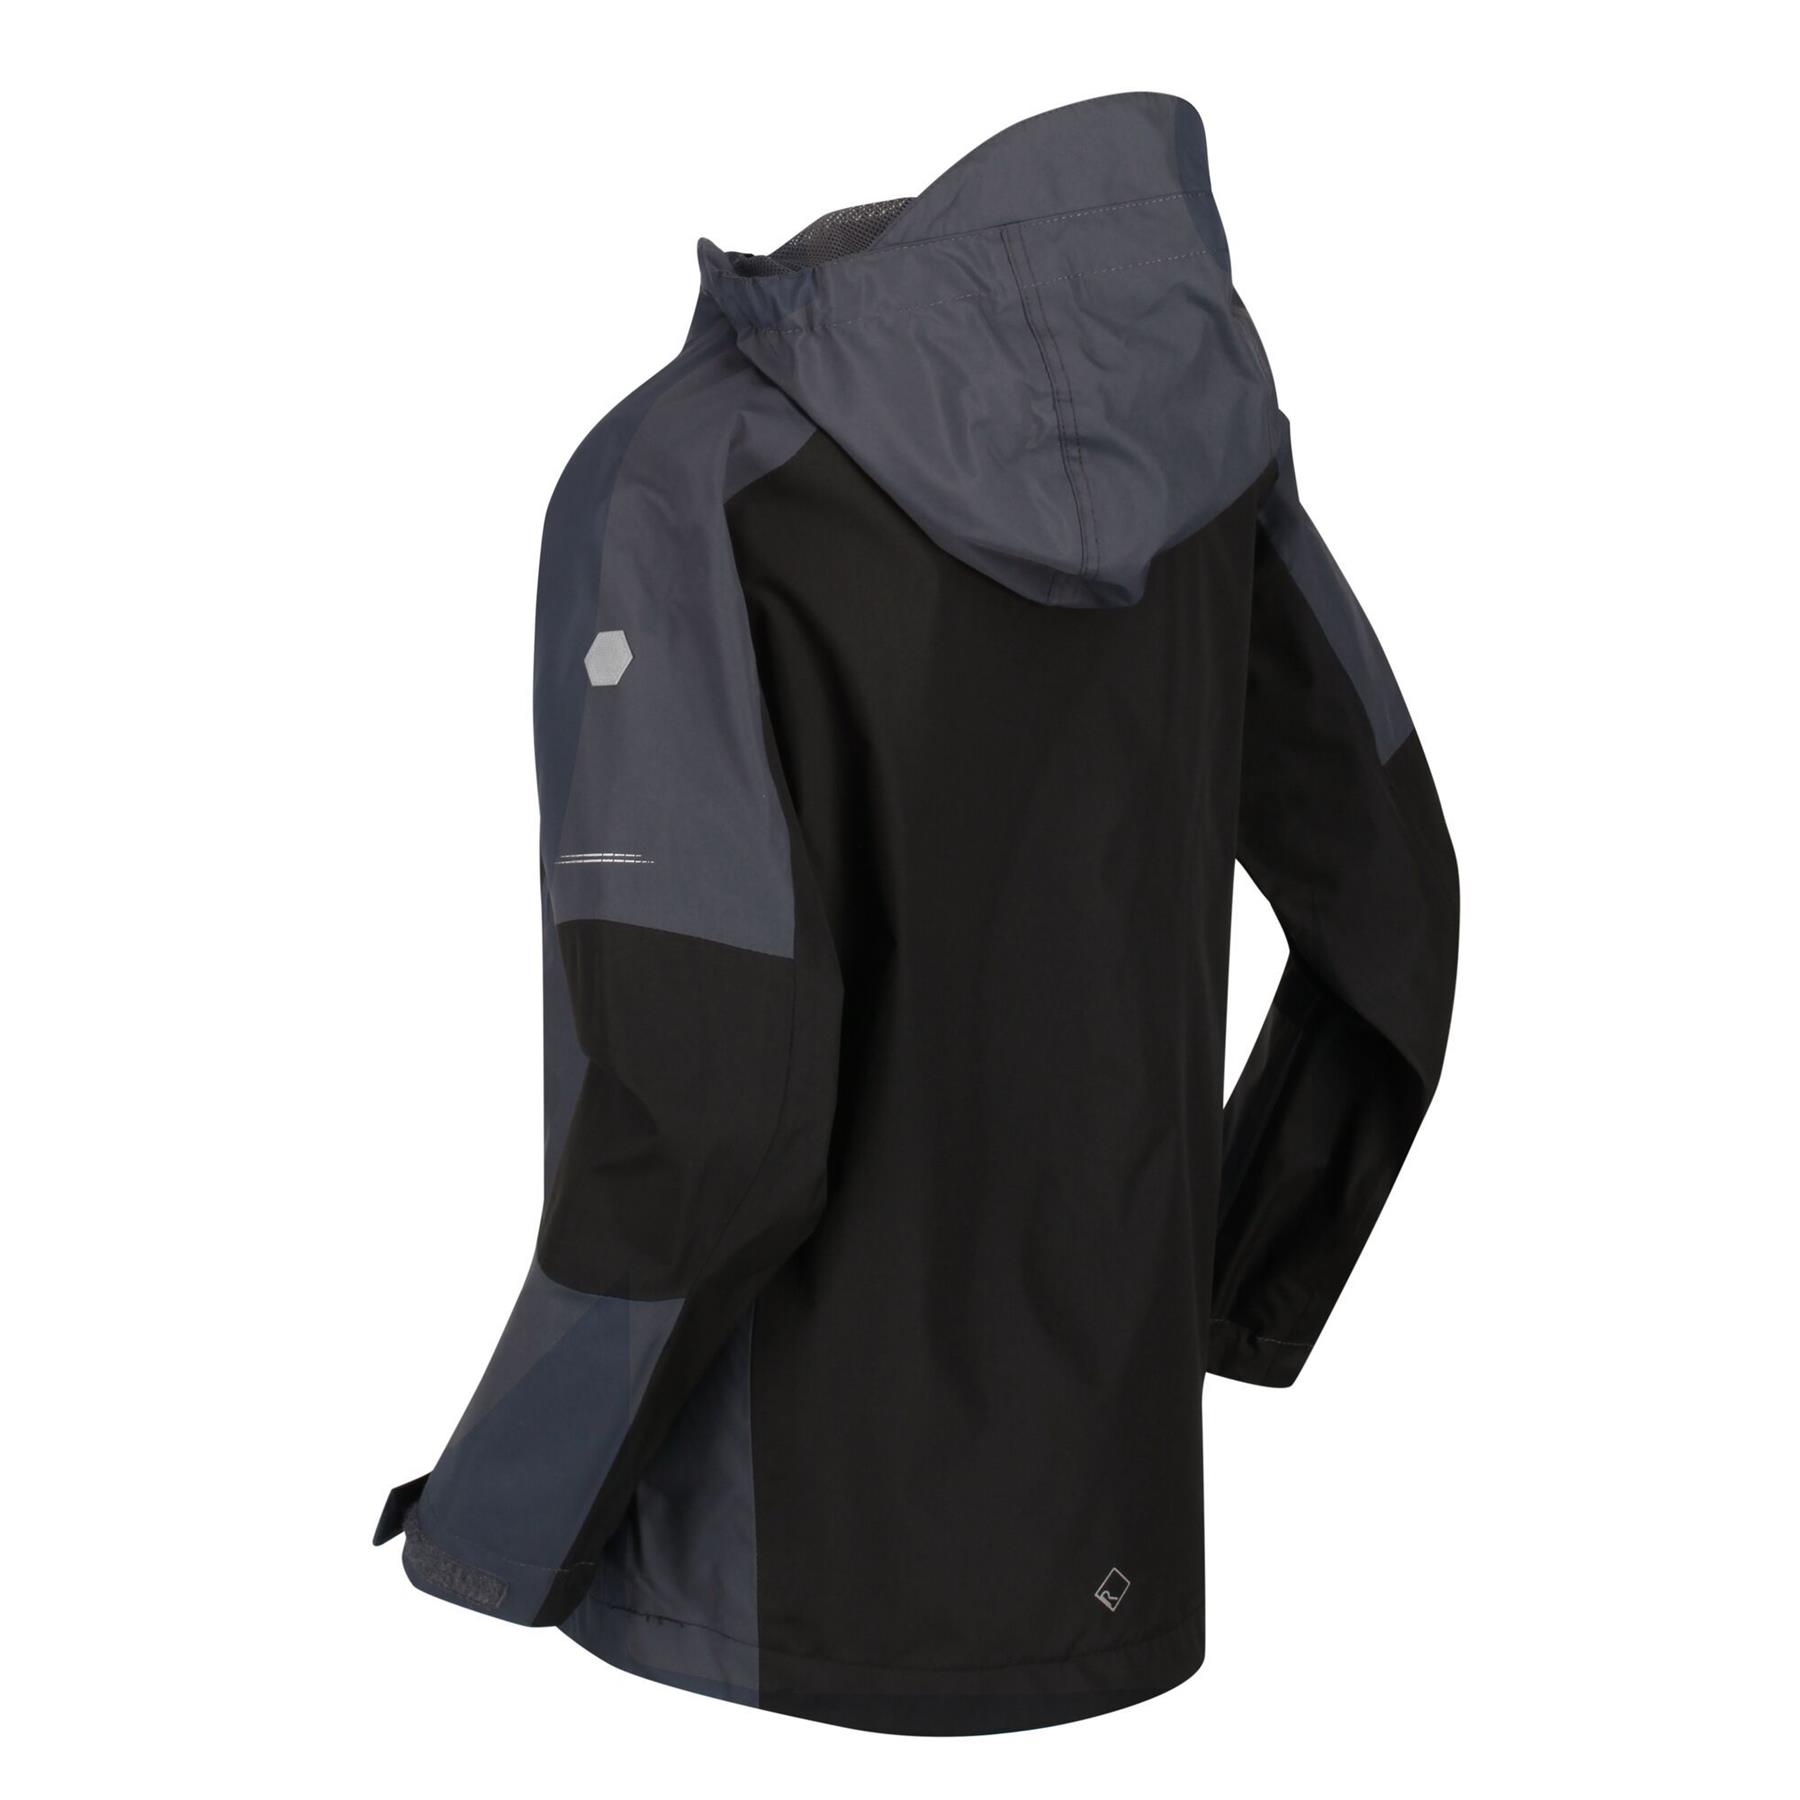 miniatuur 8 - Regatta Kids Calderdale II Waterproof Hooded Zip Pocket Jacket Boy Girls Coat